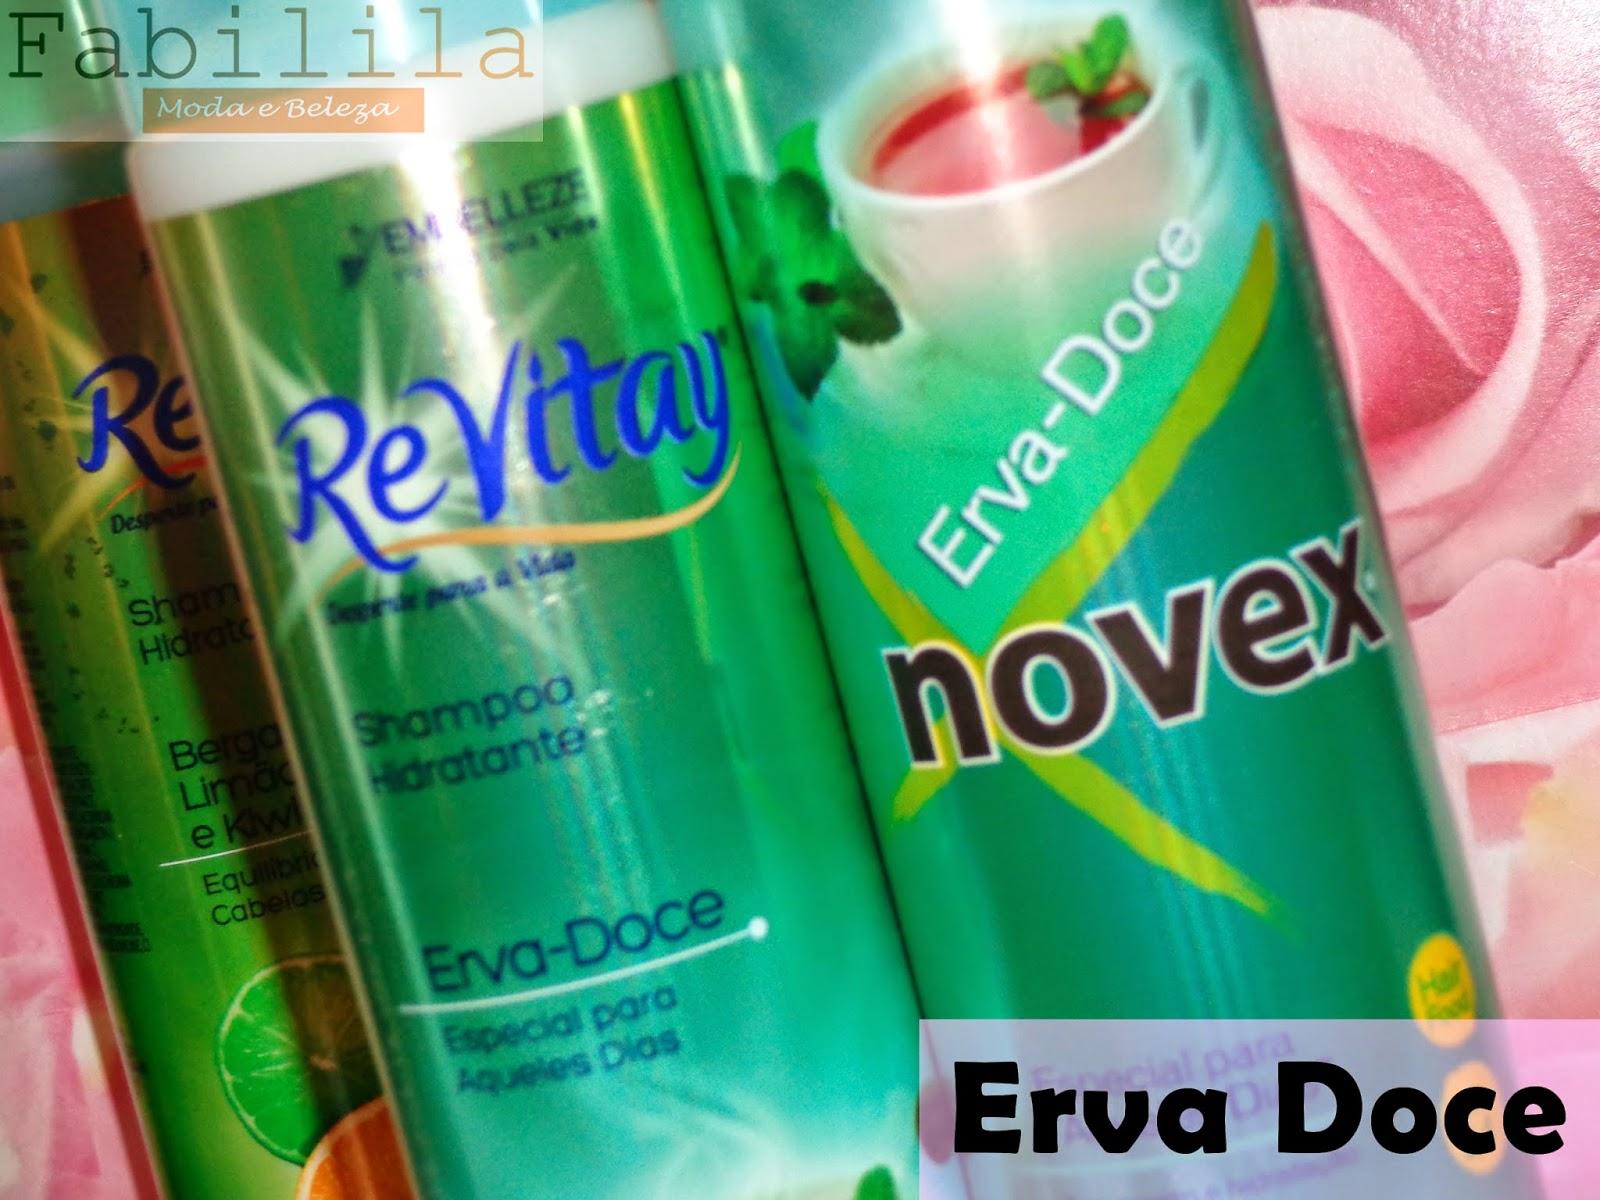 Shampoo e Condicionador Erva Doce ReVitay Embelleze